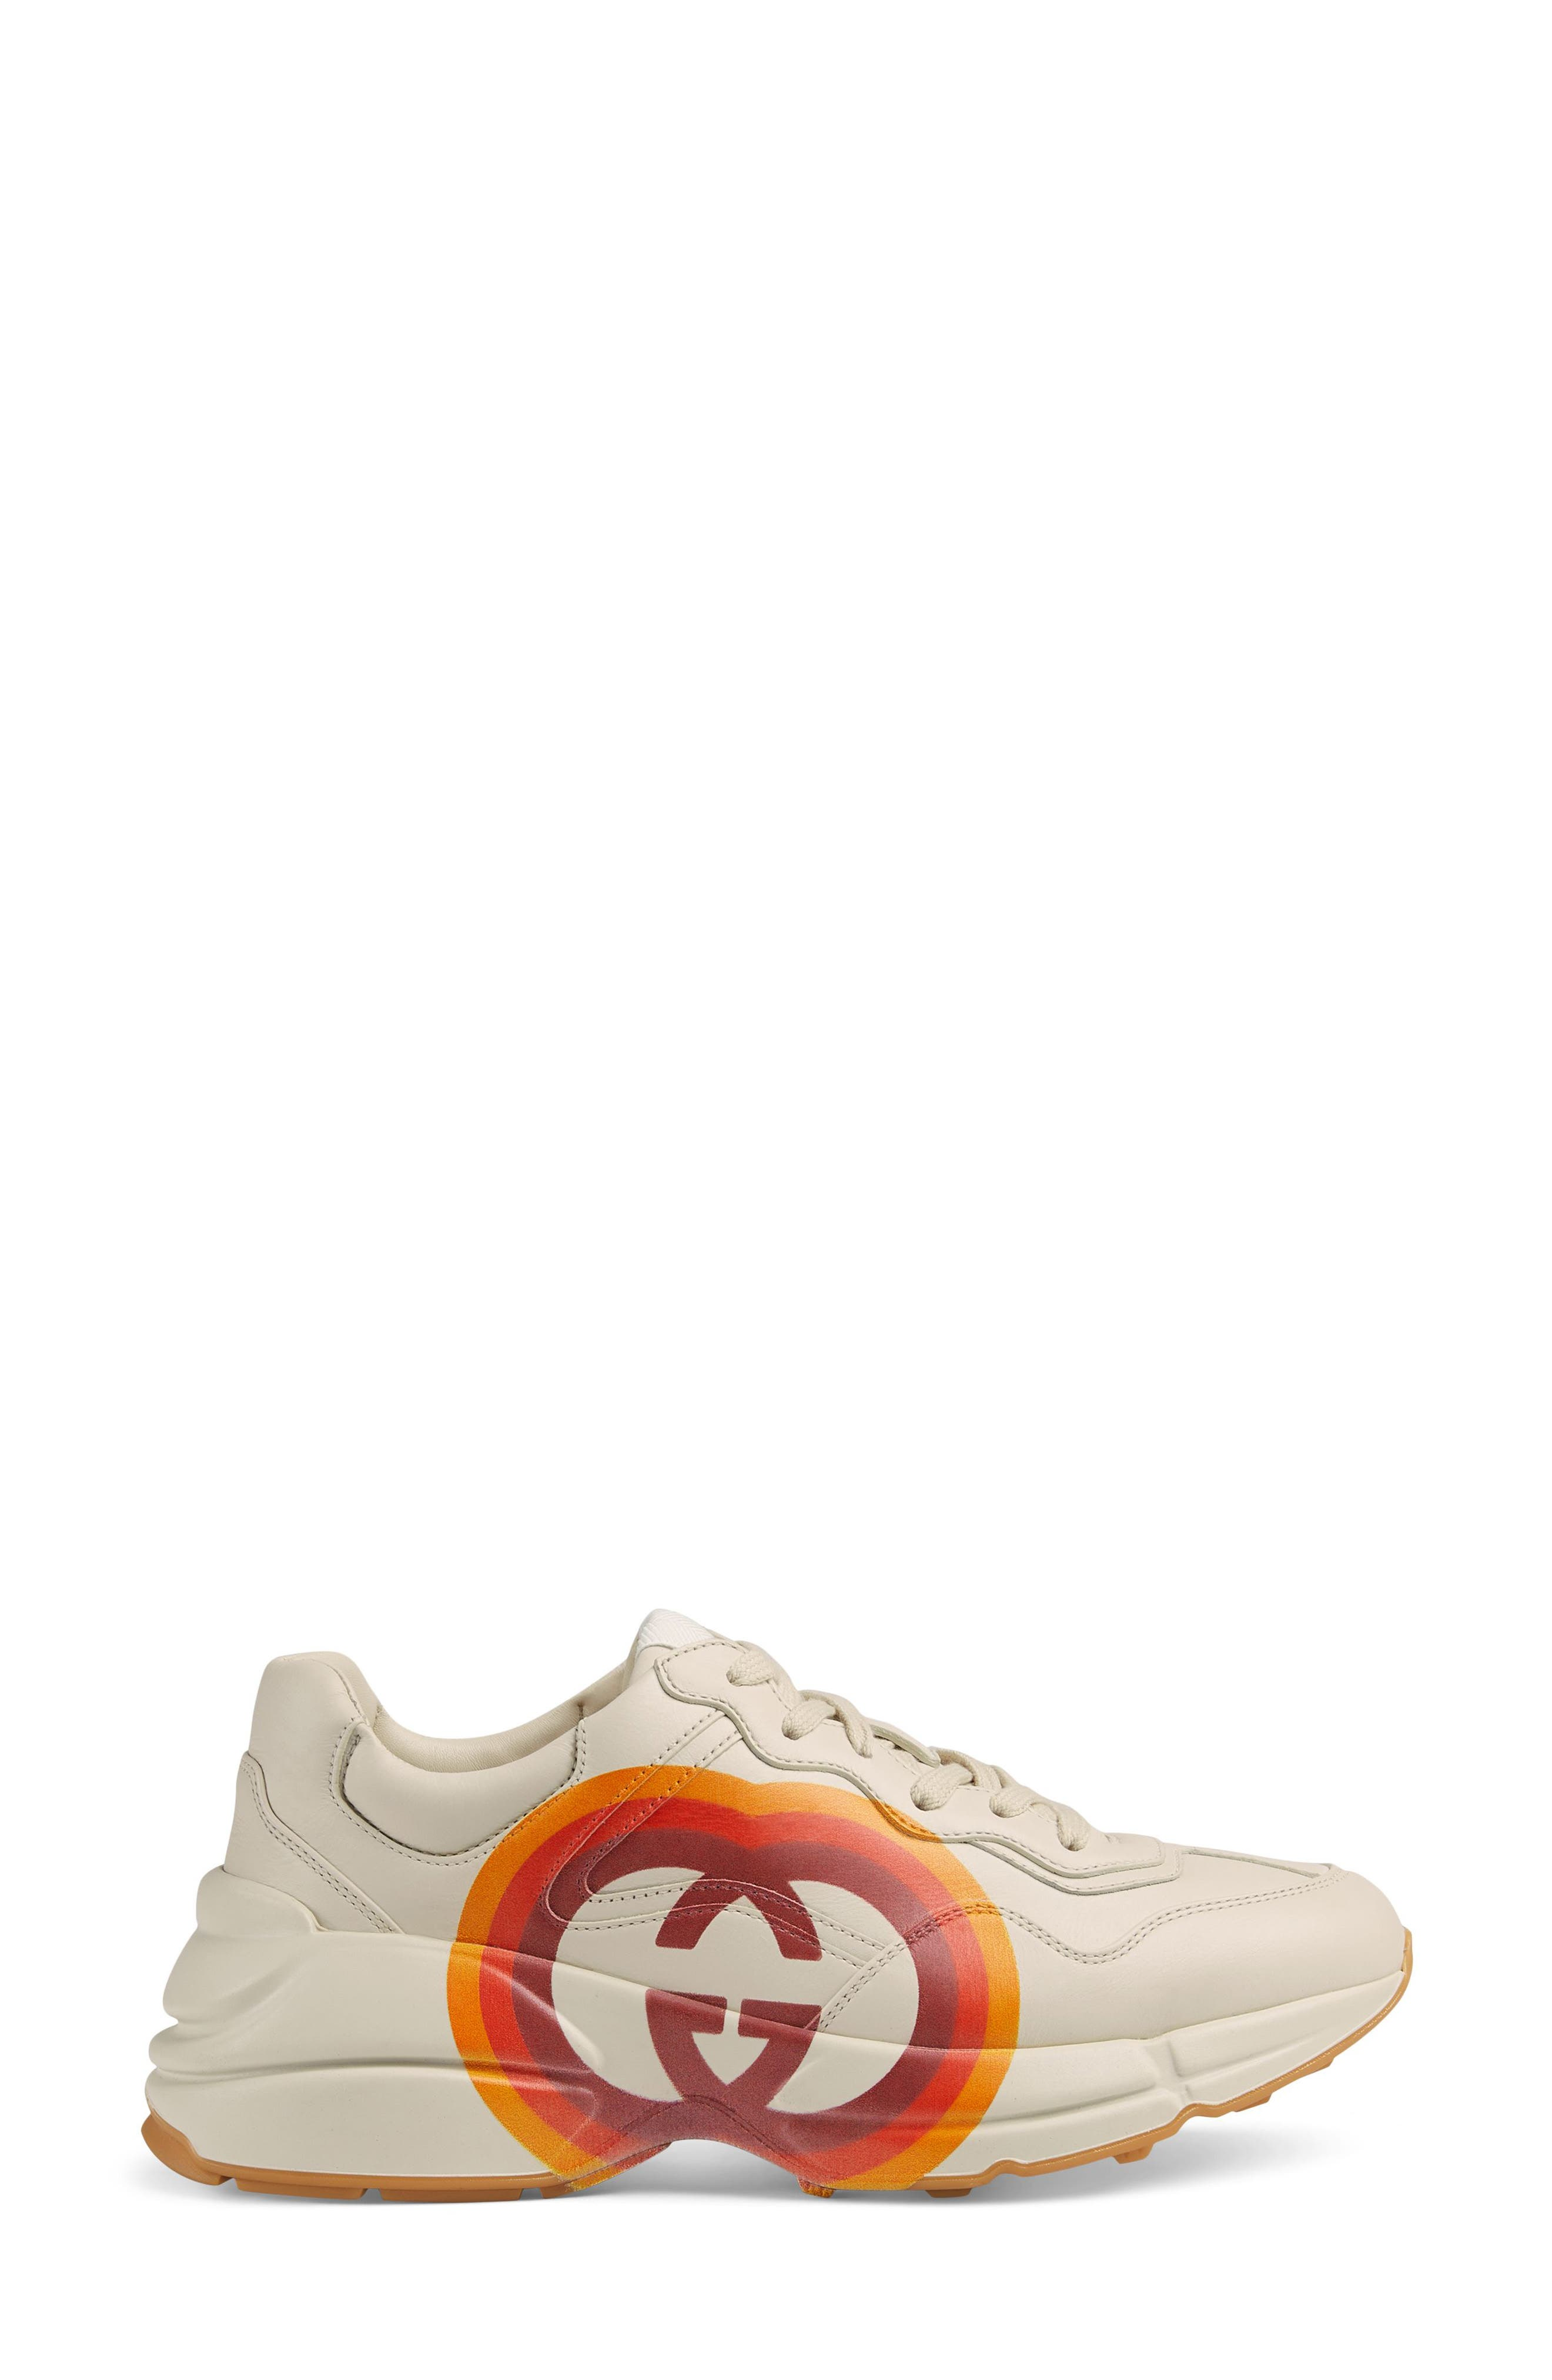 Rhyton Double G Sneaker,                             Alternate thumbnail 2, color,                             MYSTIC WHITE